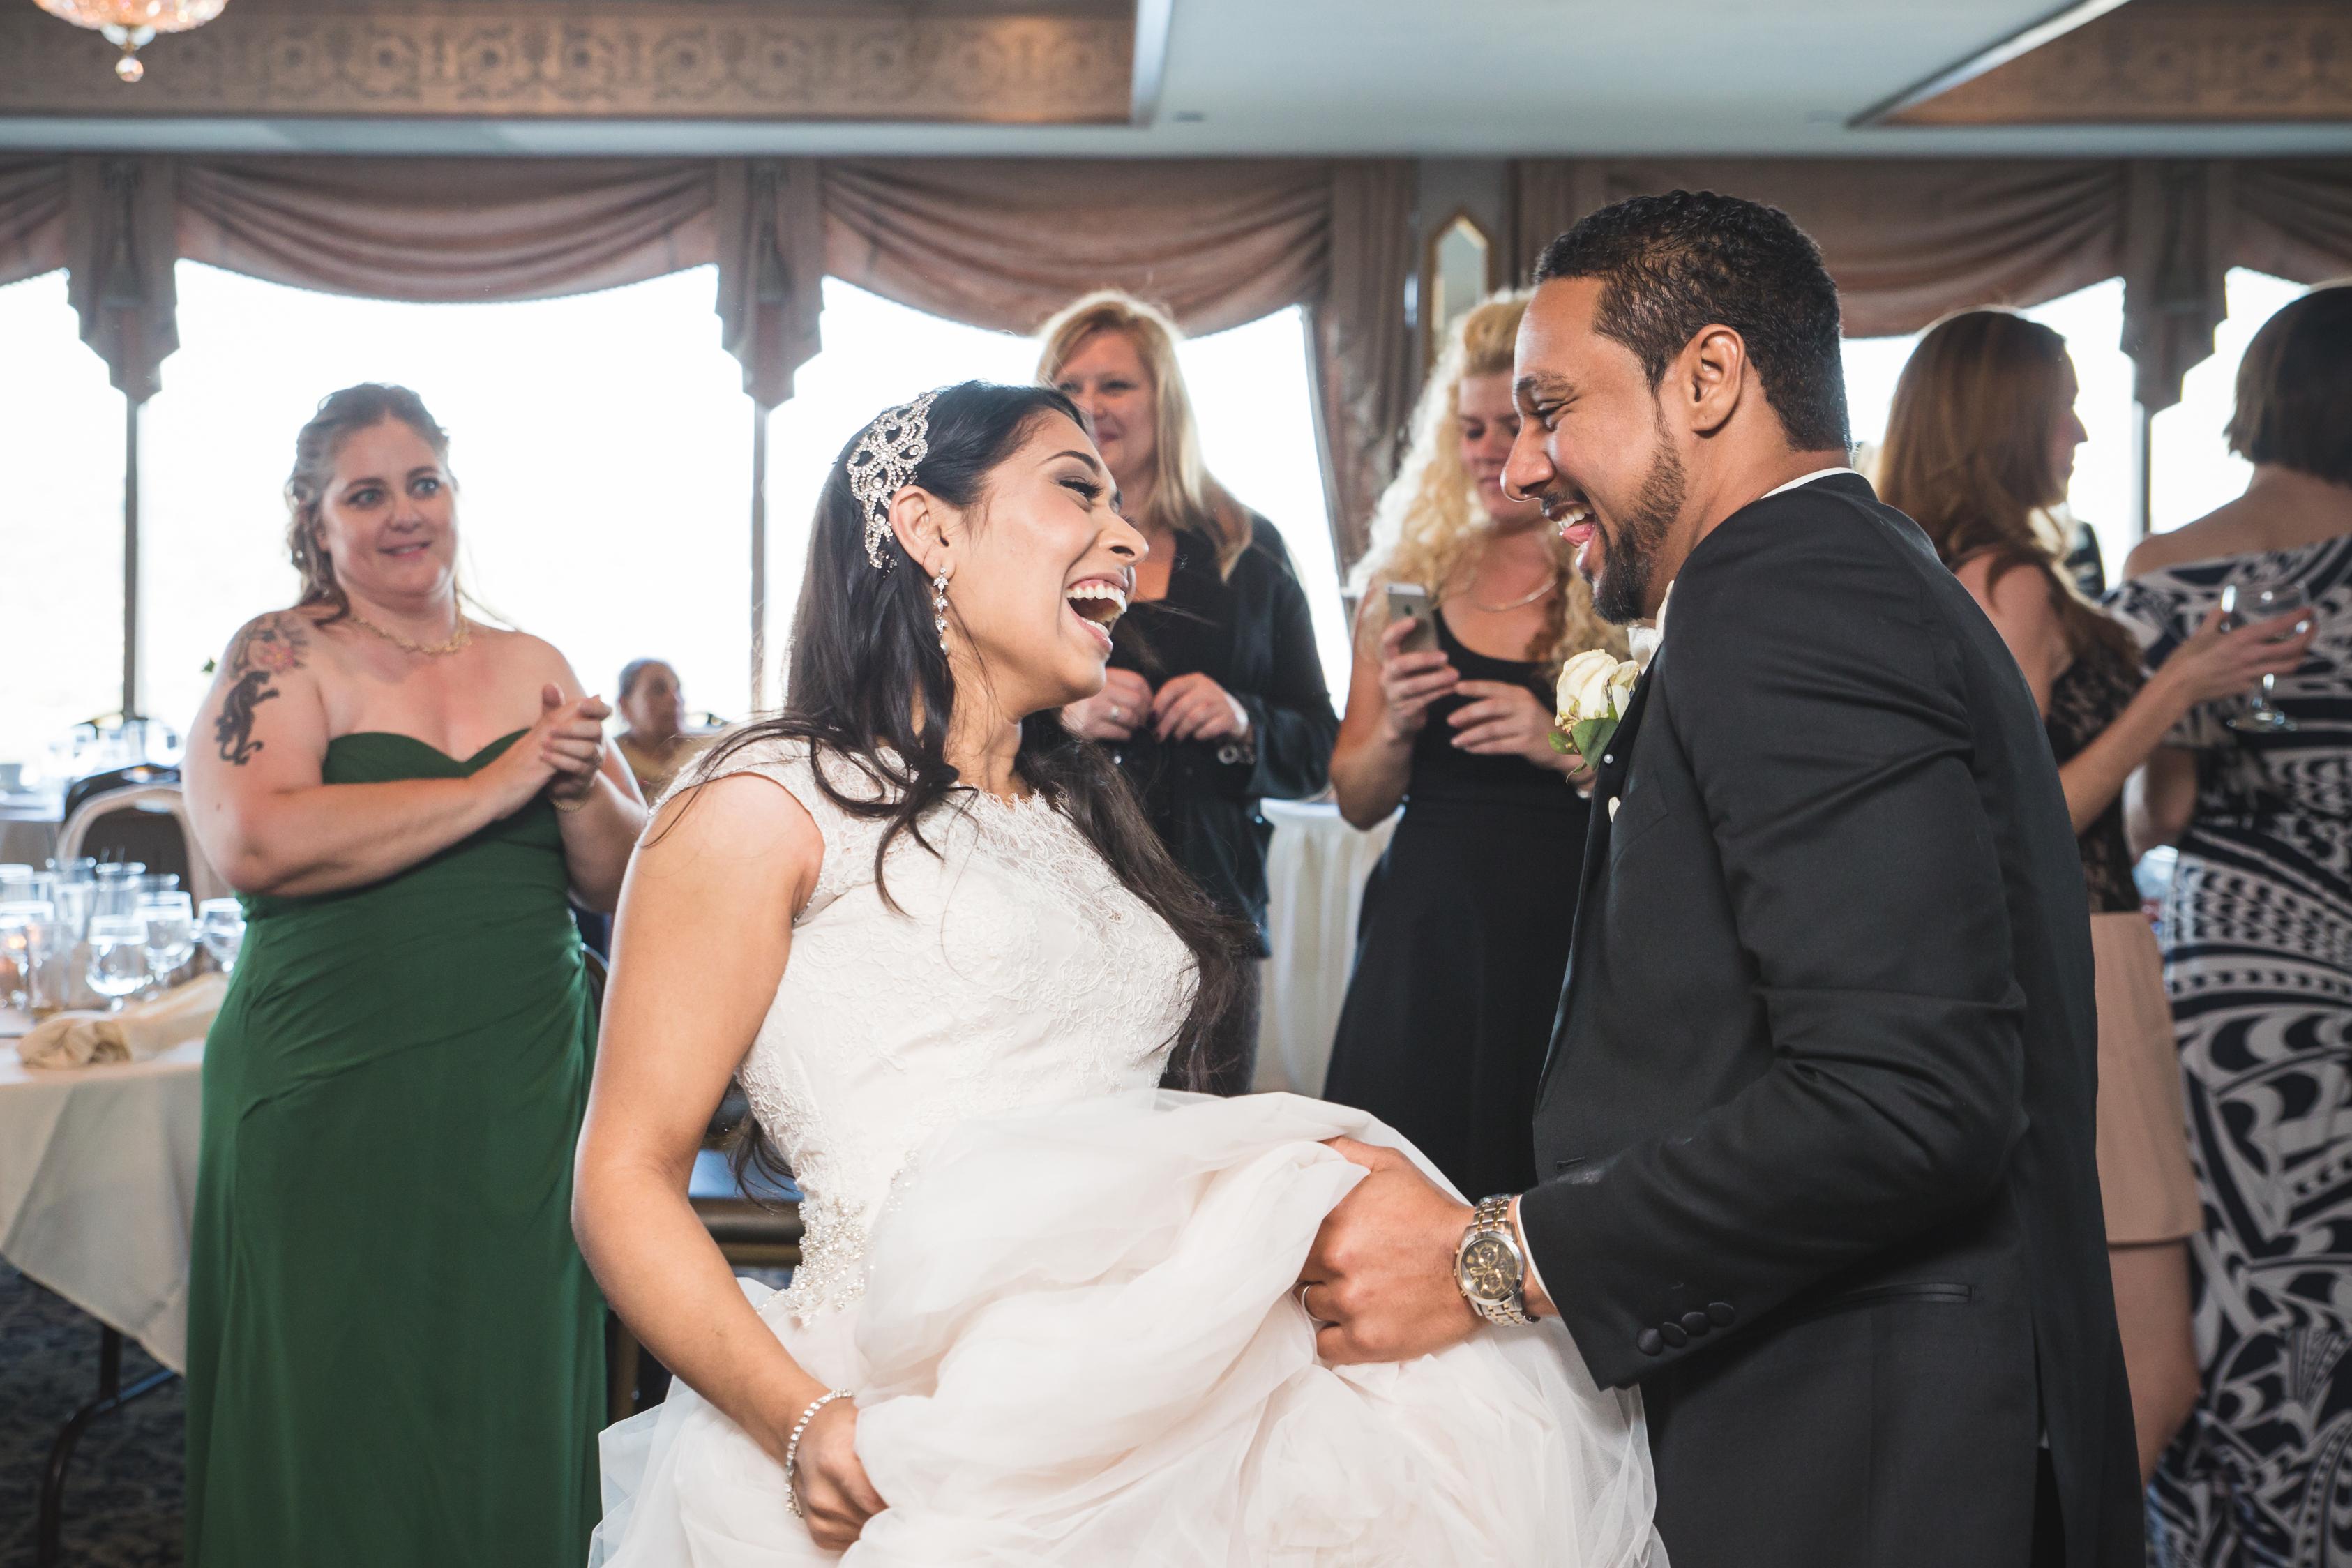 Pittsburgh wedding photographer LeMont Man Nguyen Photography